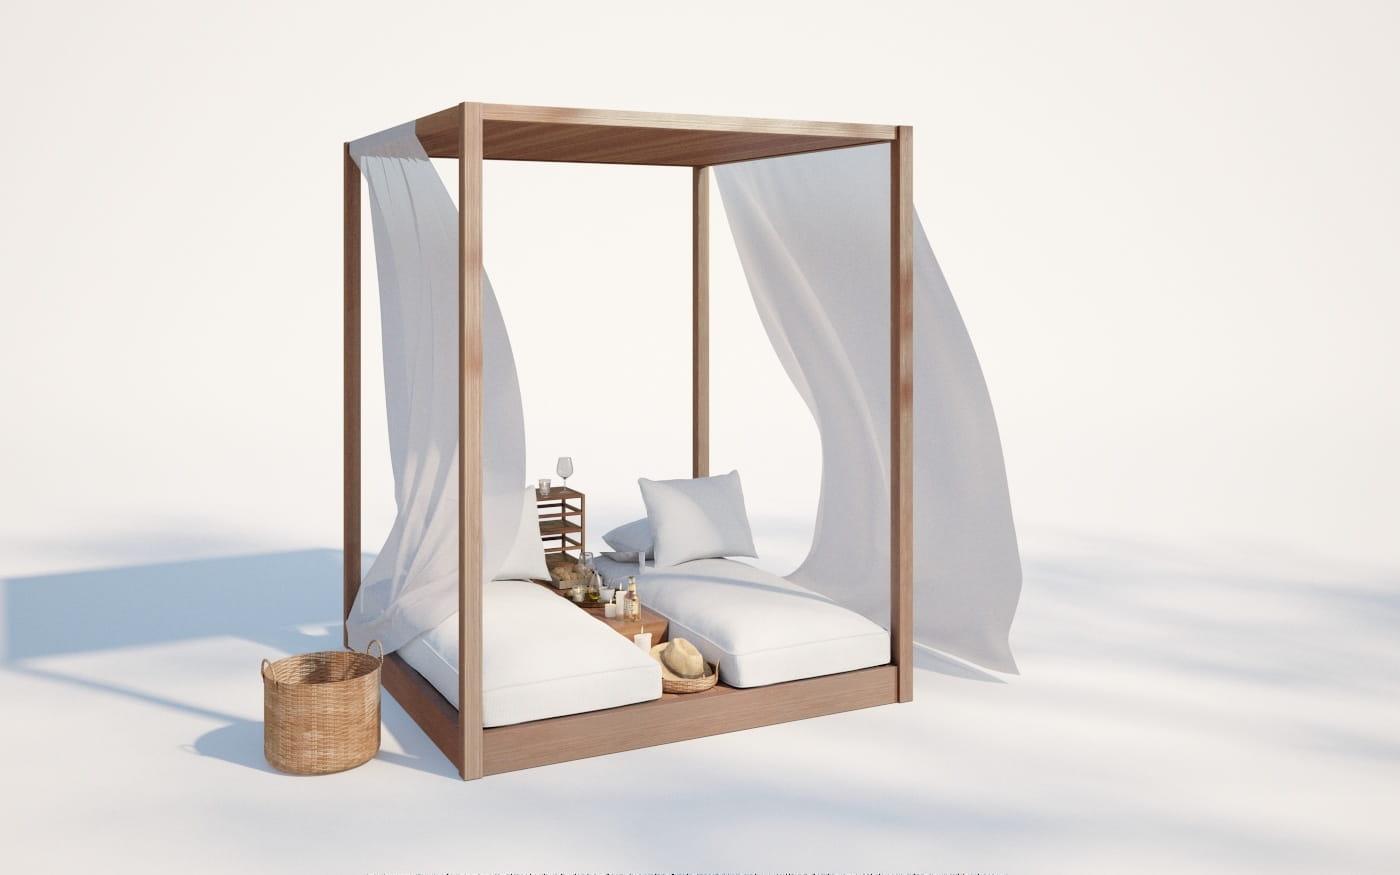 Furniture set 11 AM220 Archmodels